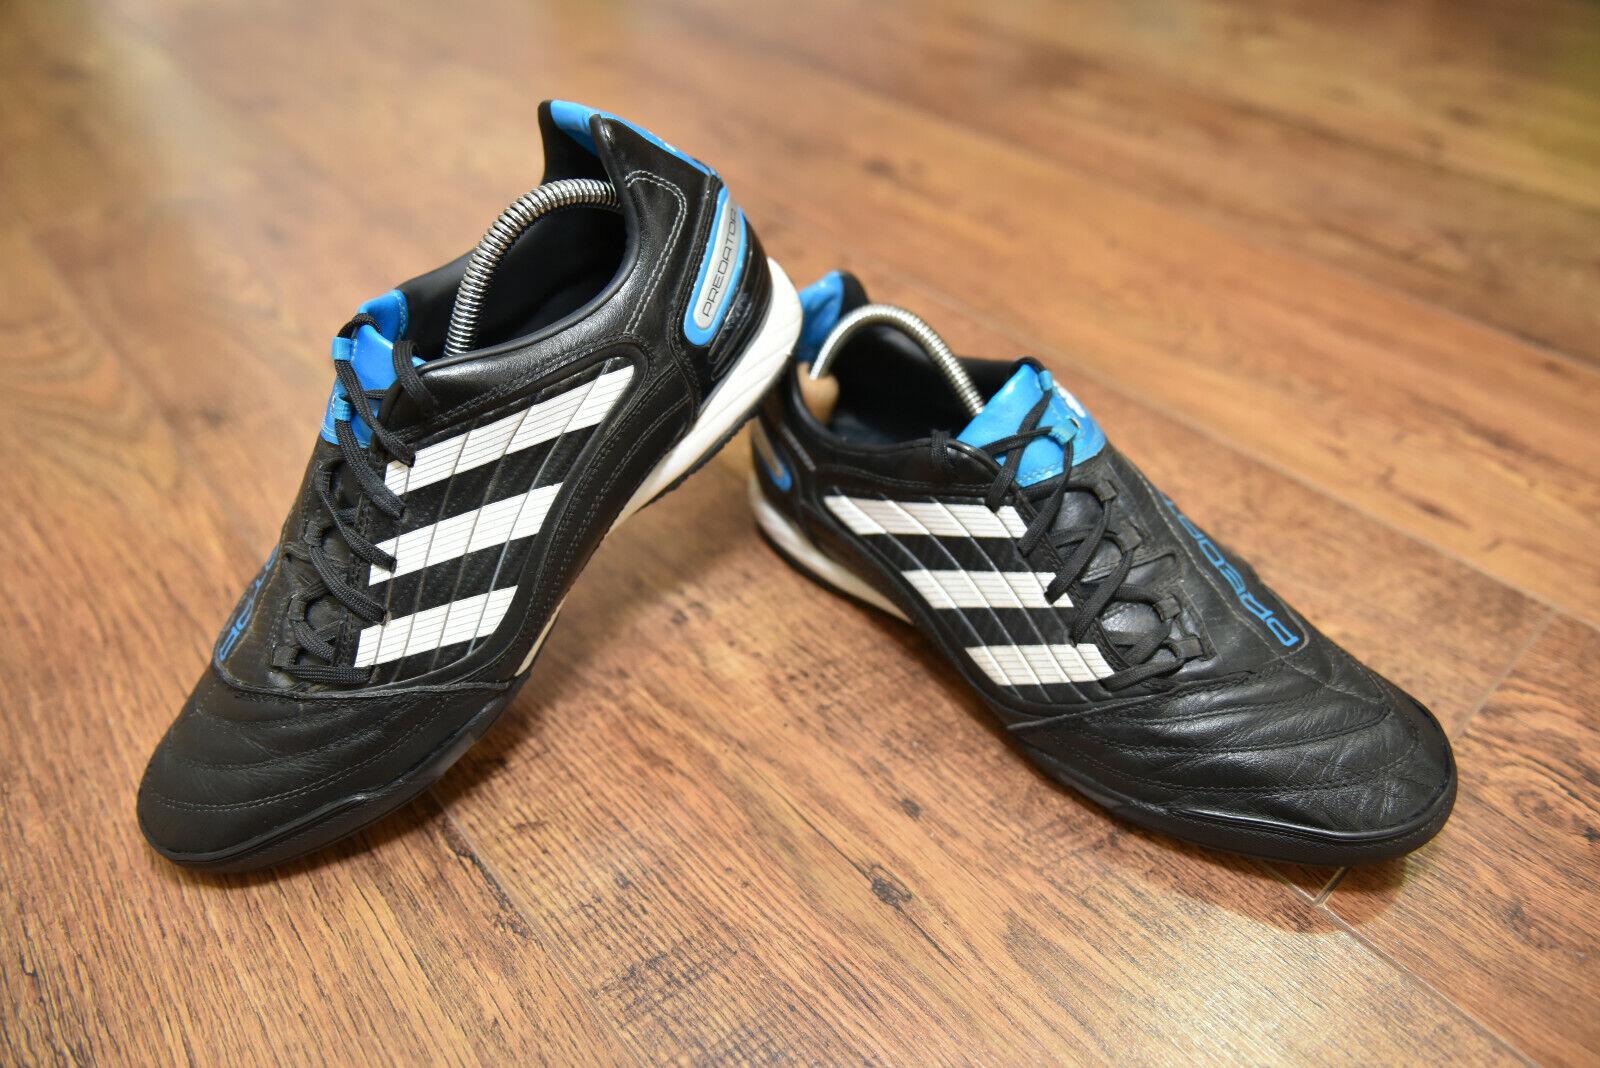 Adidas Projoator X Ag Astro Césped botas De Fútbol OptiFit entrenadores